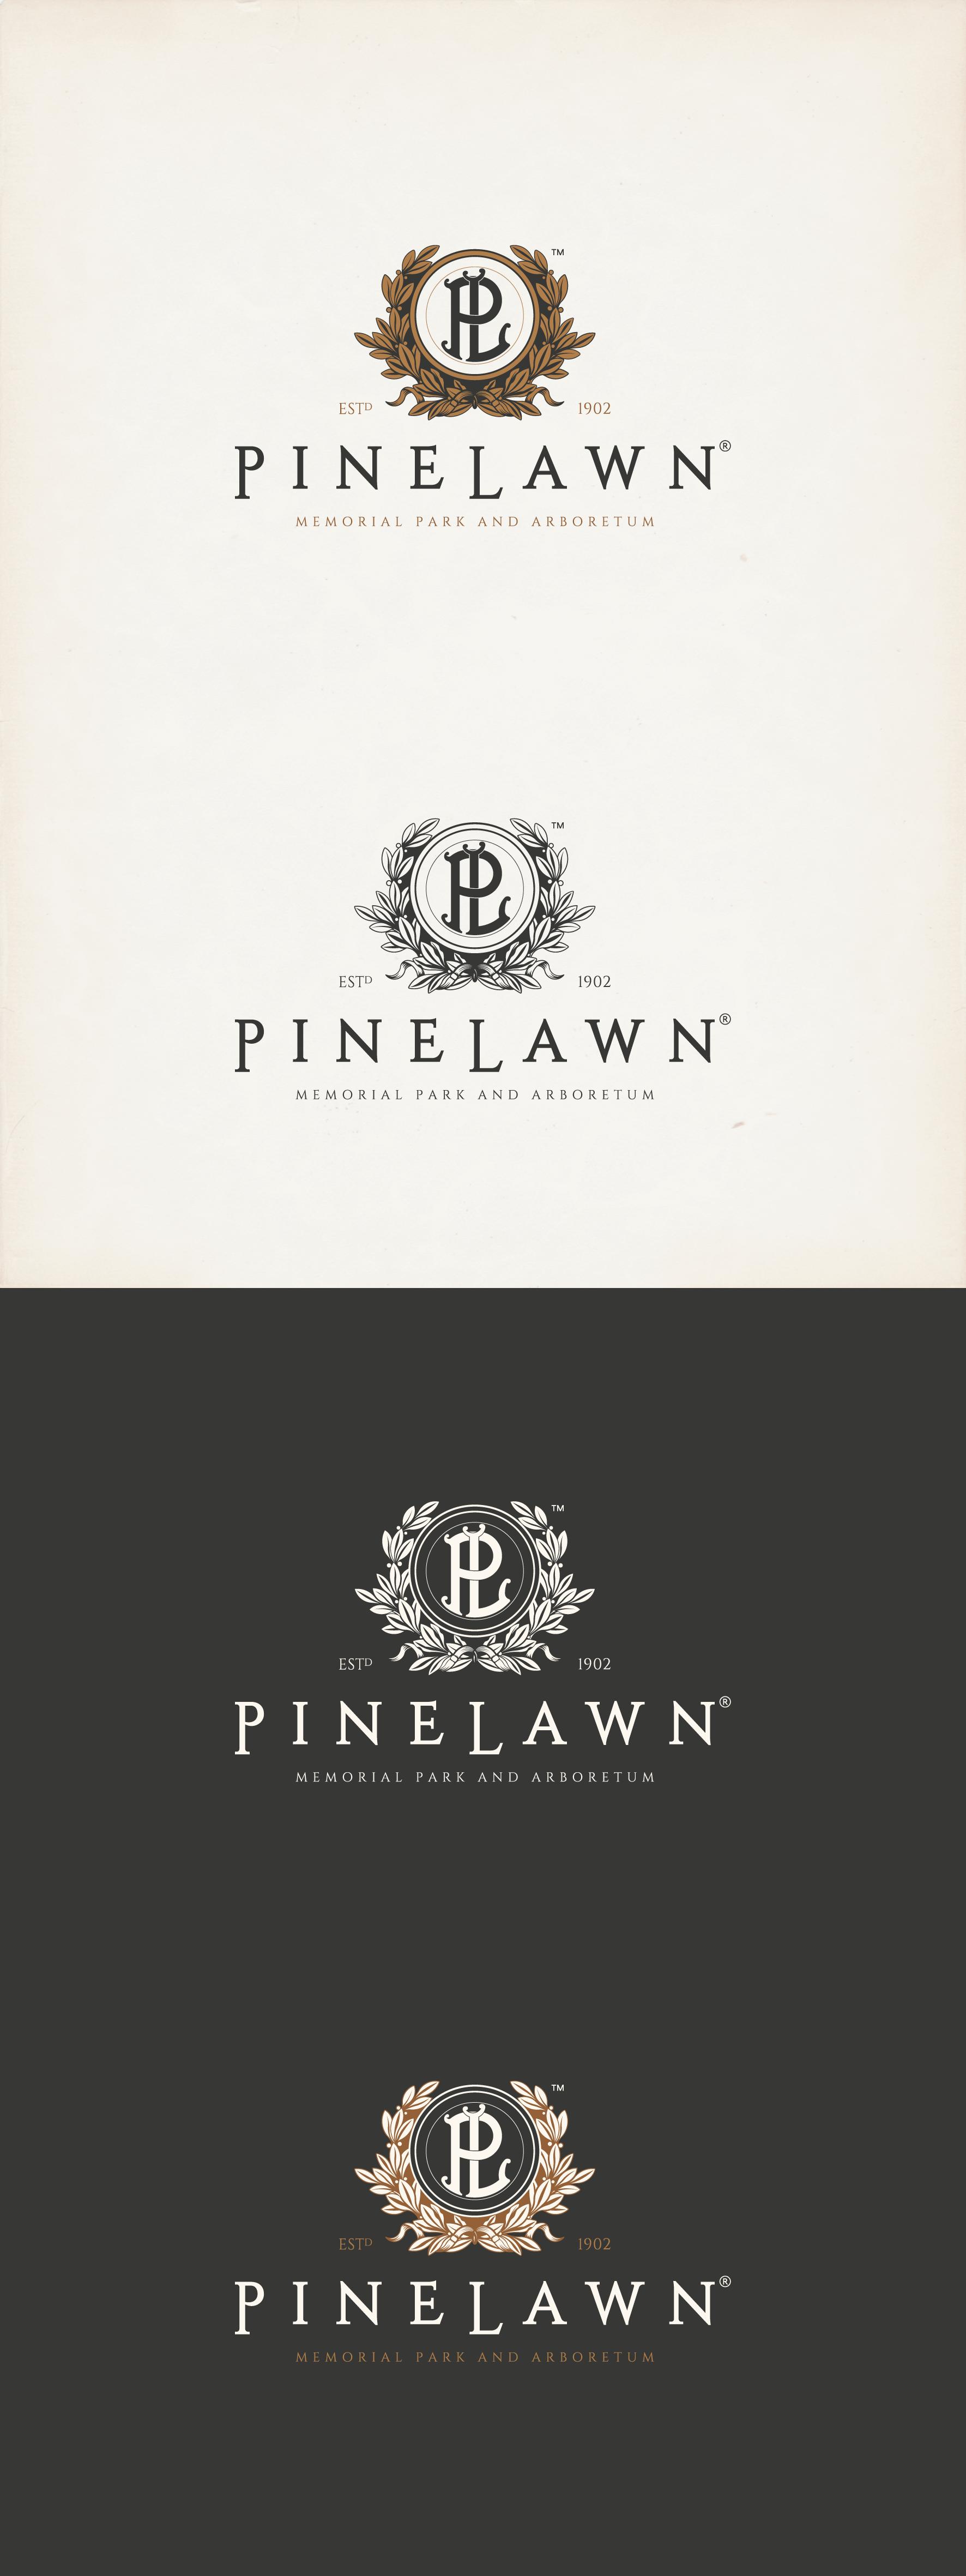 Logo & Brand Identity Pack upgrade.